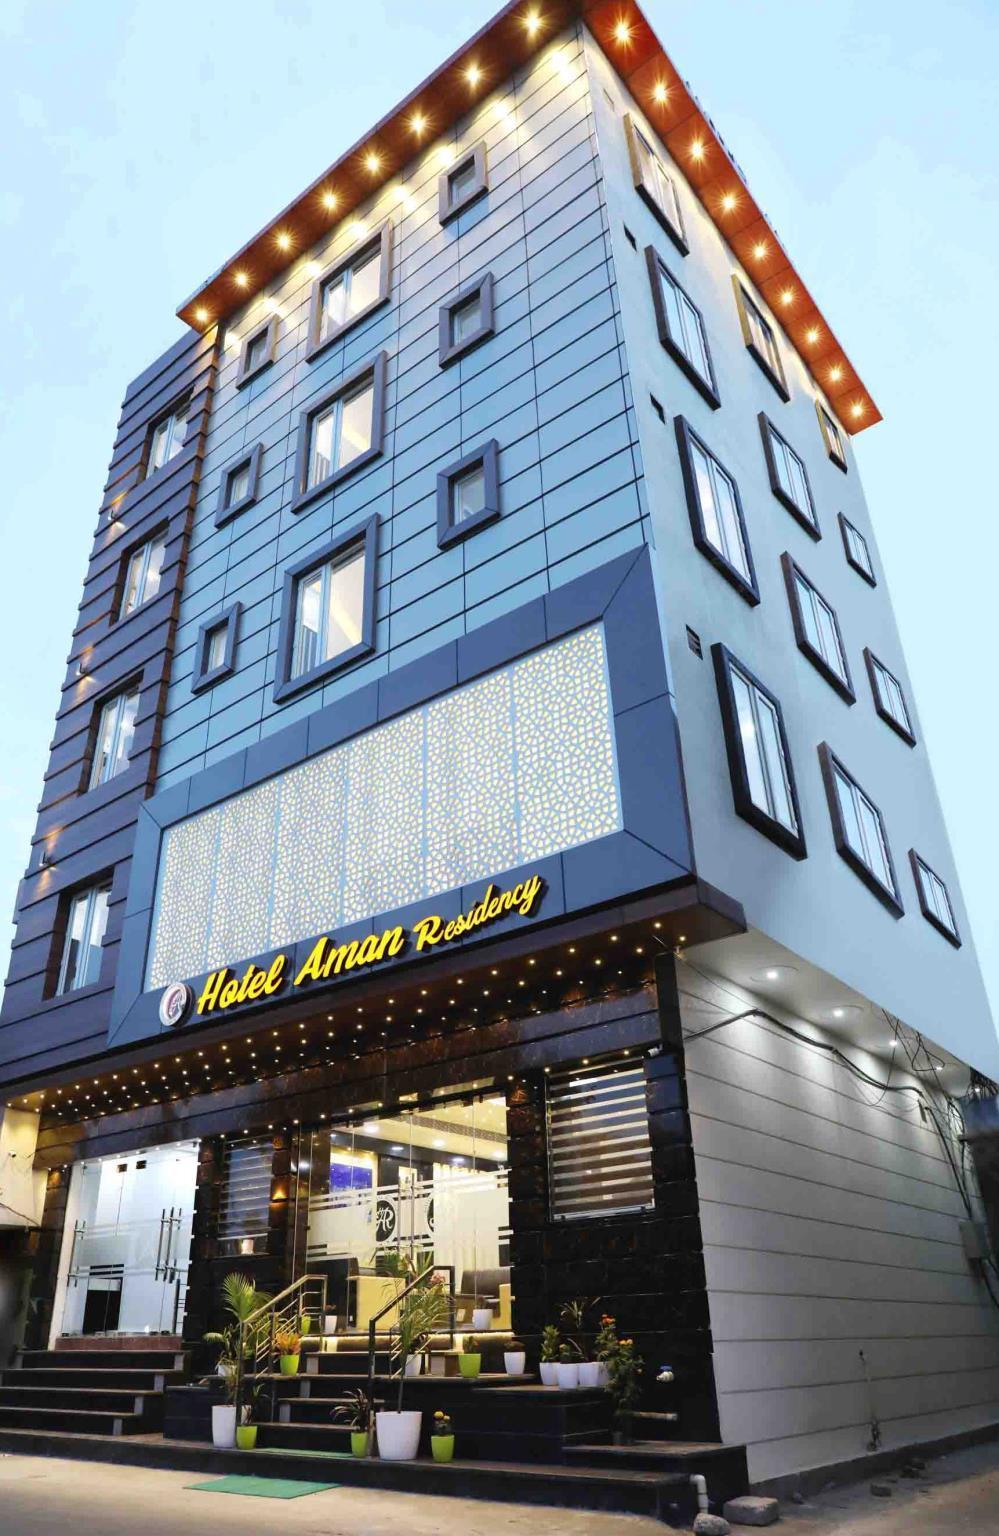 HOTEL AMAN RESIDENCY AMRITSAR